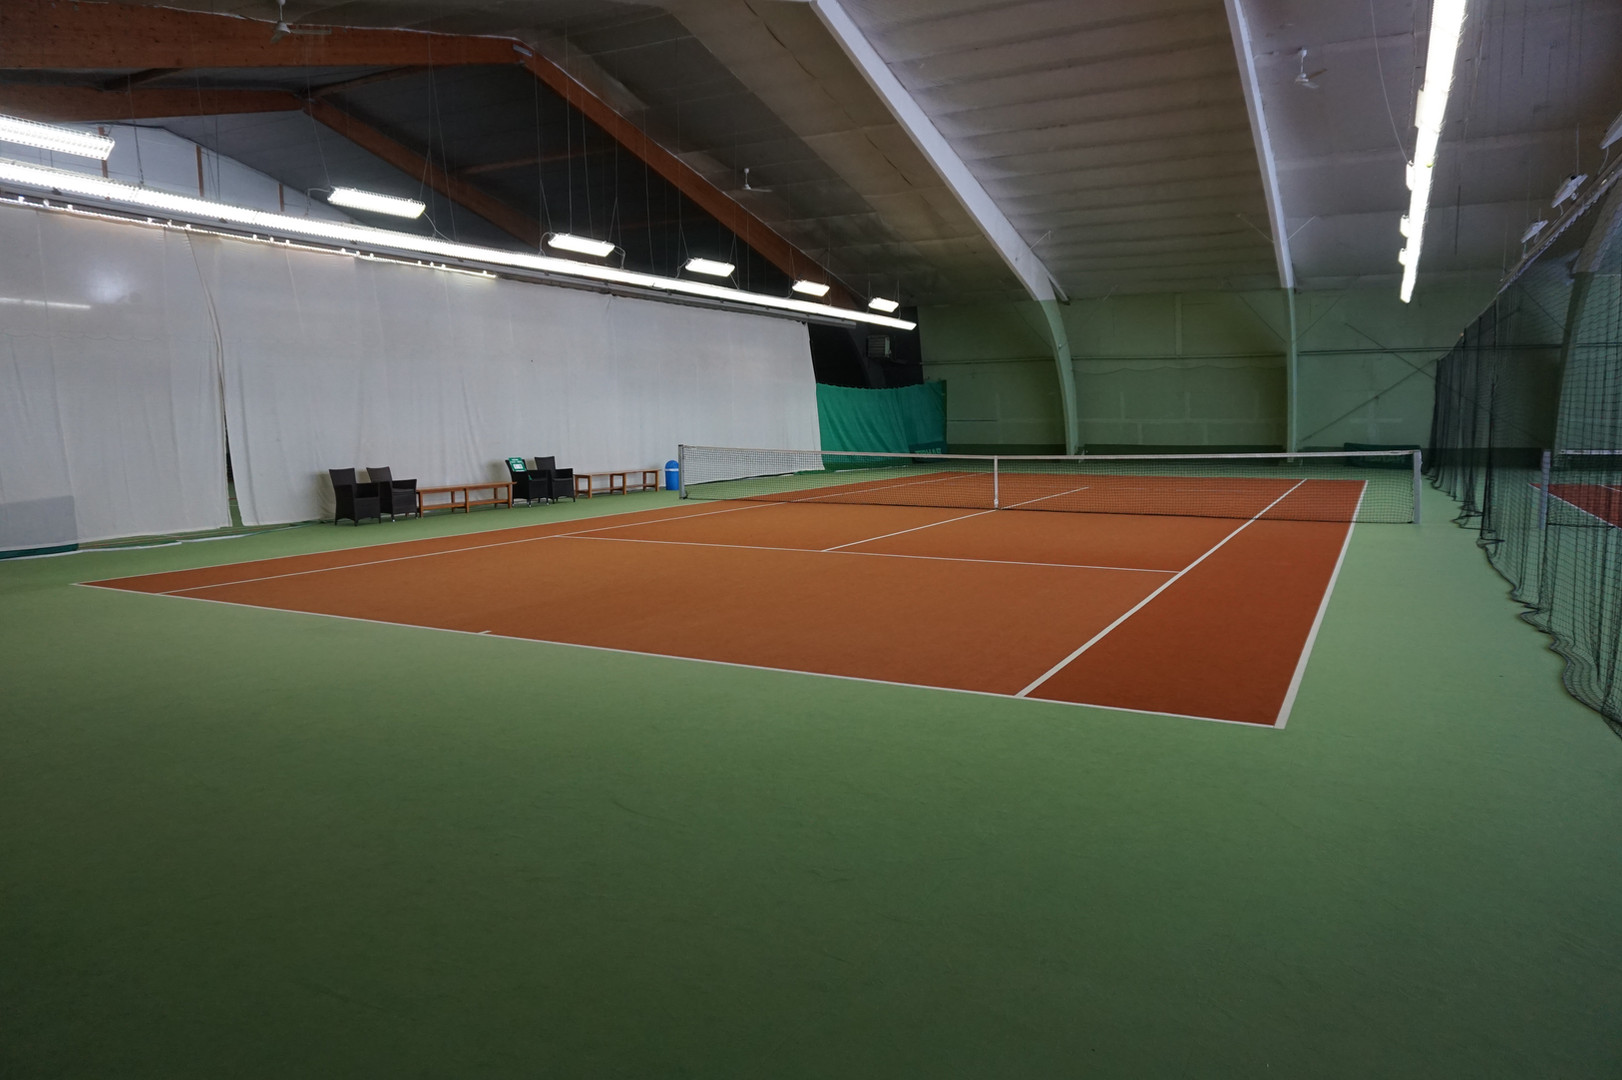 Tenisplatz.JPG